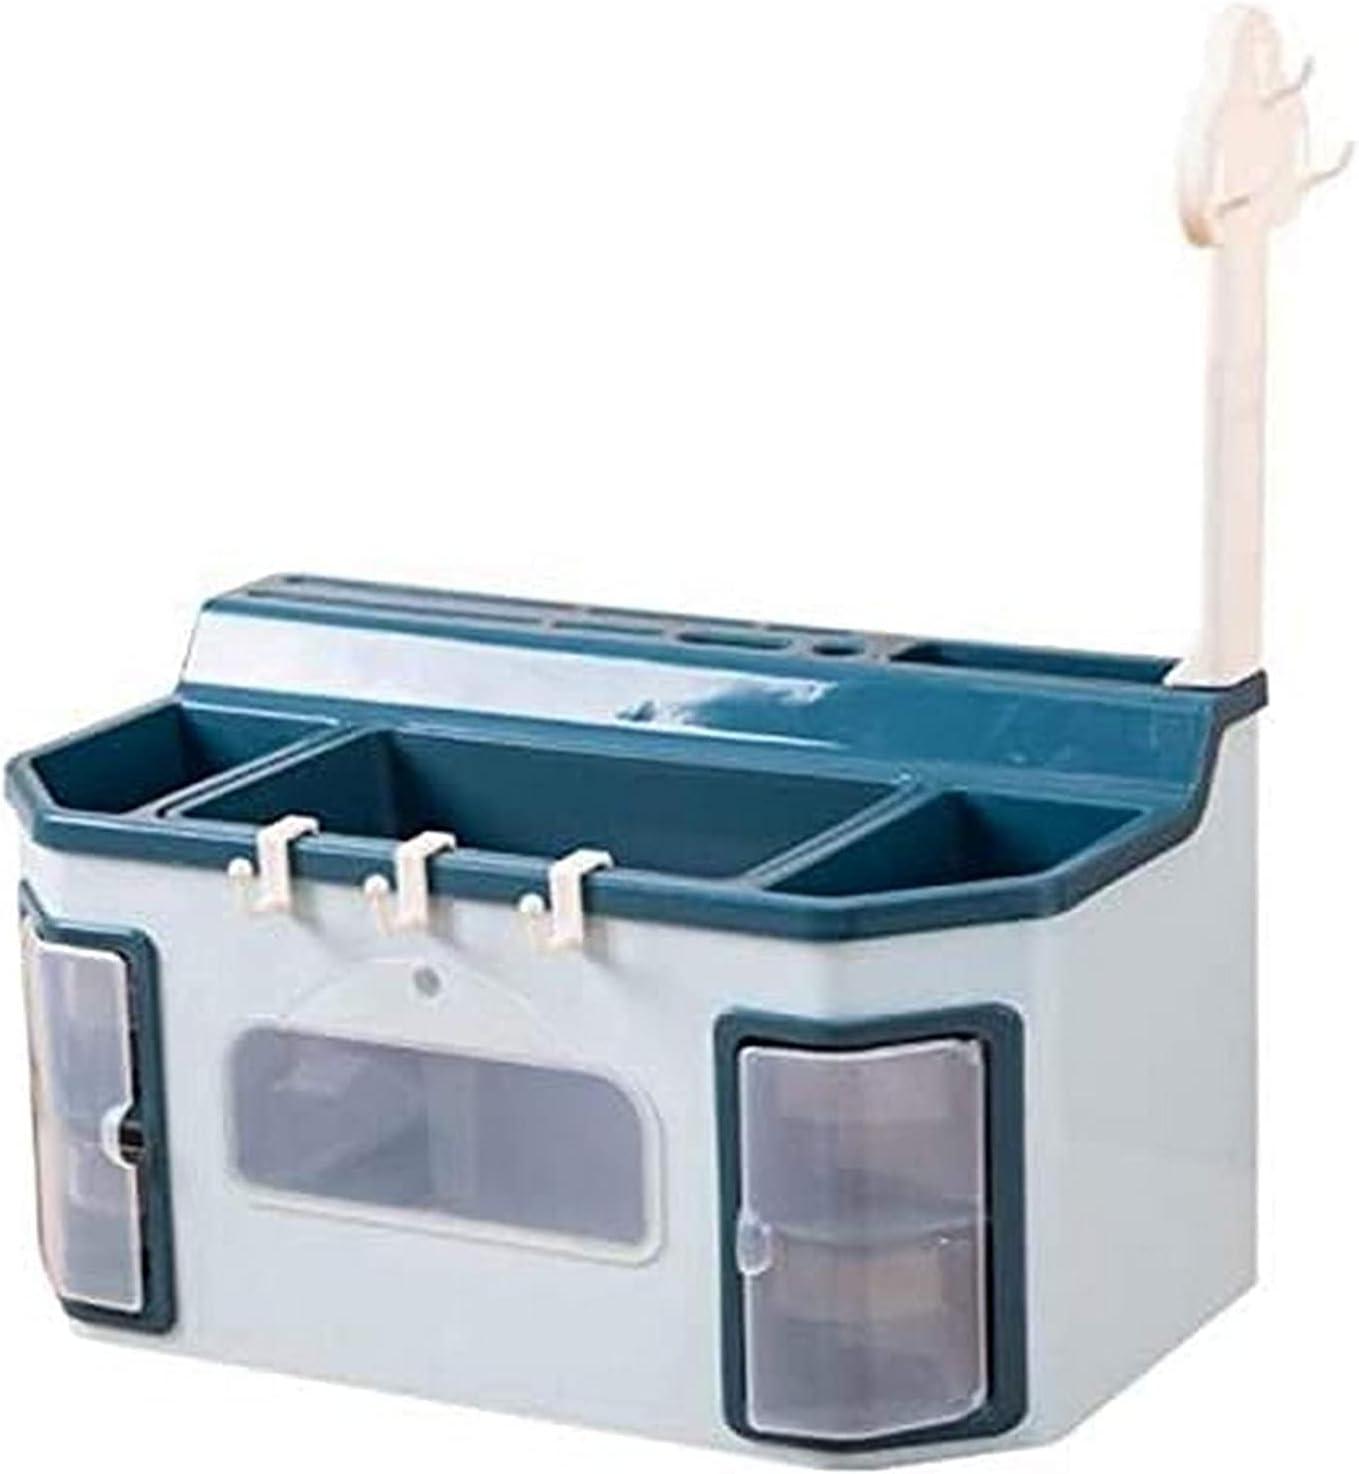 FMOGE High quality Fashion Multifunctiona Mesa Mall Spice Rack Shelf Box Kitchen Tools